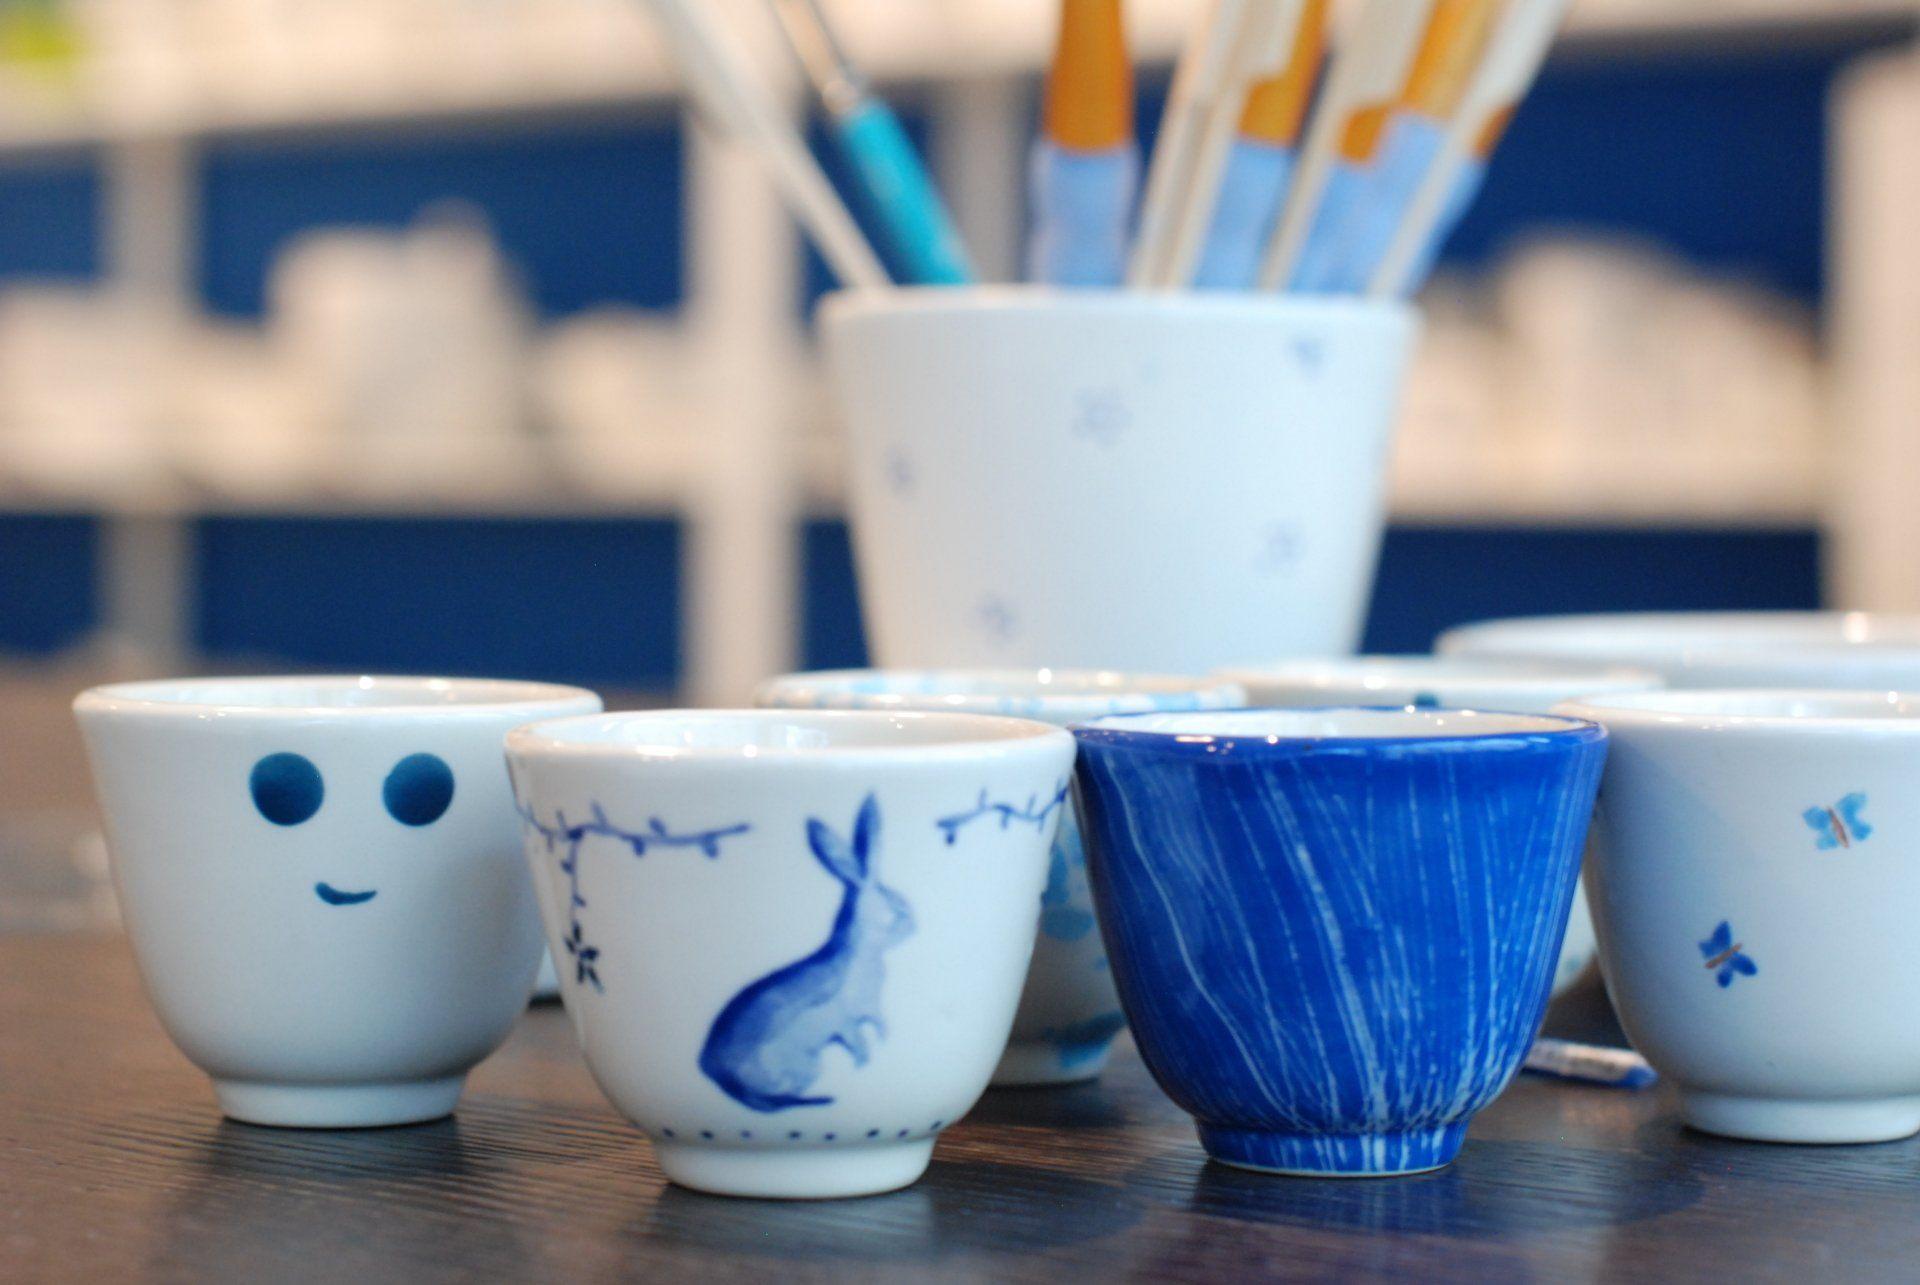 Keramik Selbst Bemalen In Neuhausen Munchen